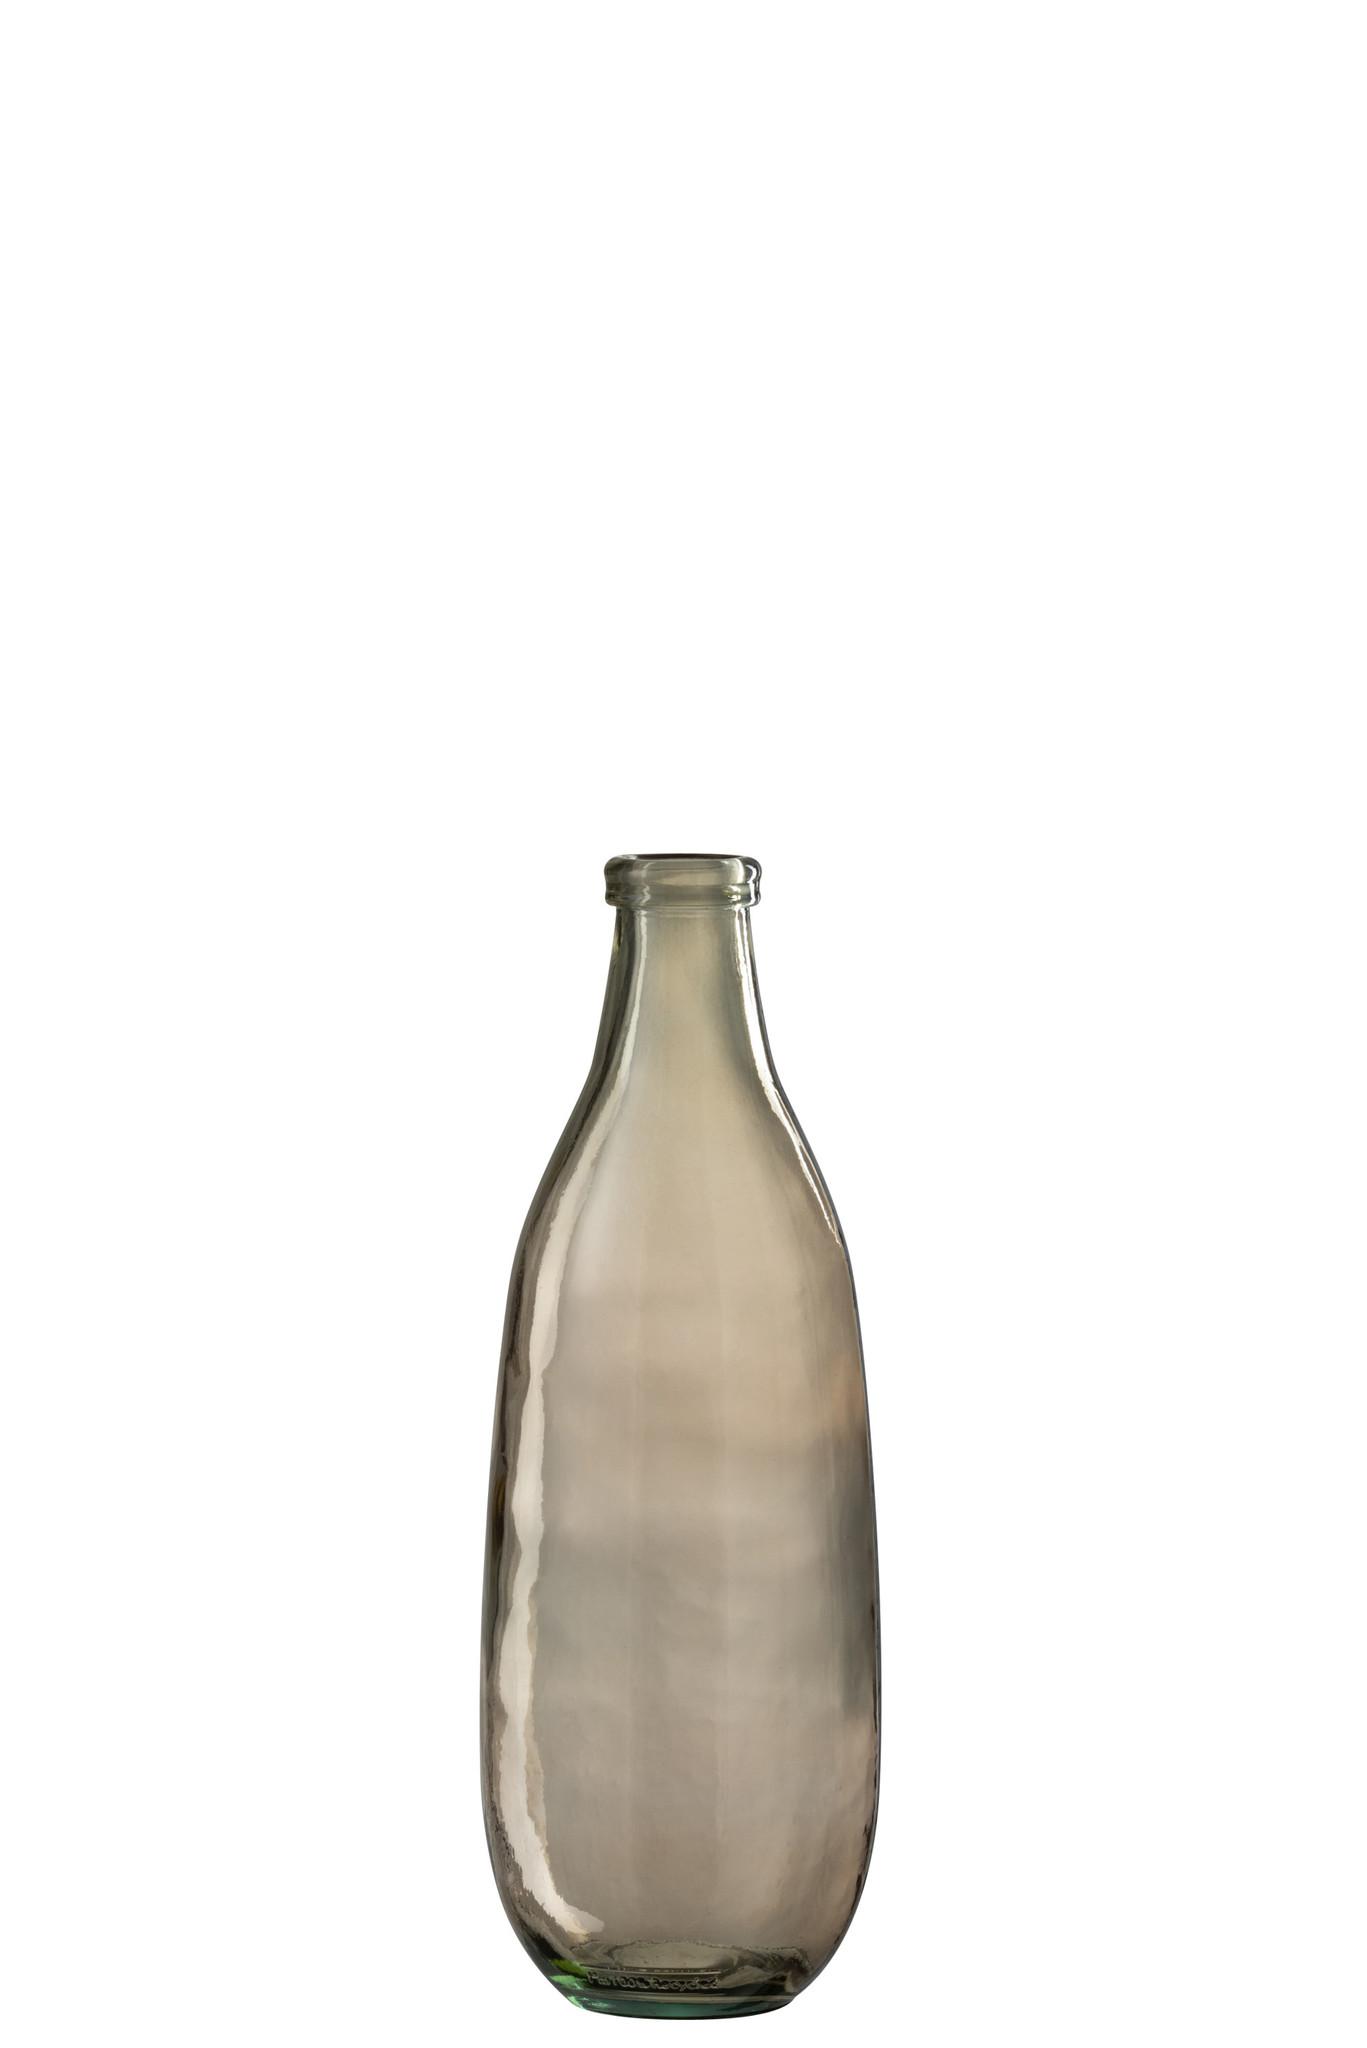 Vaas Fles Glas Lichtbruin Large-1